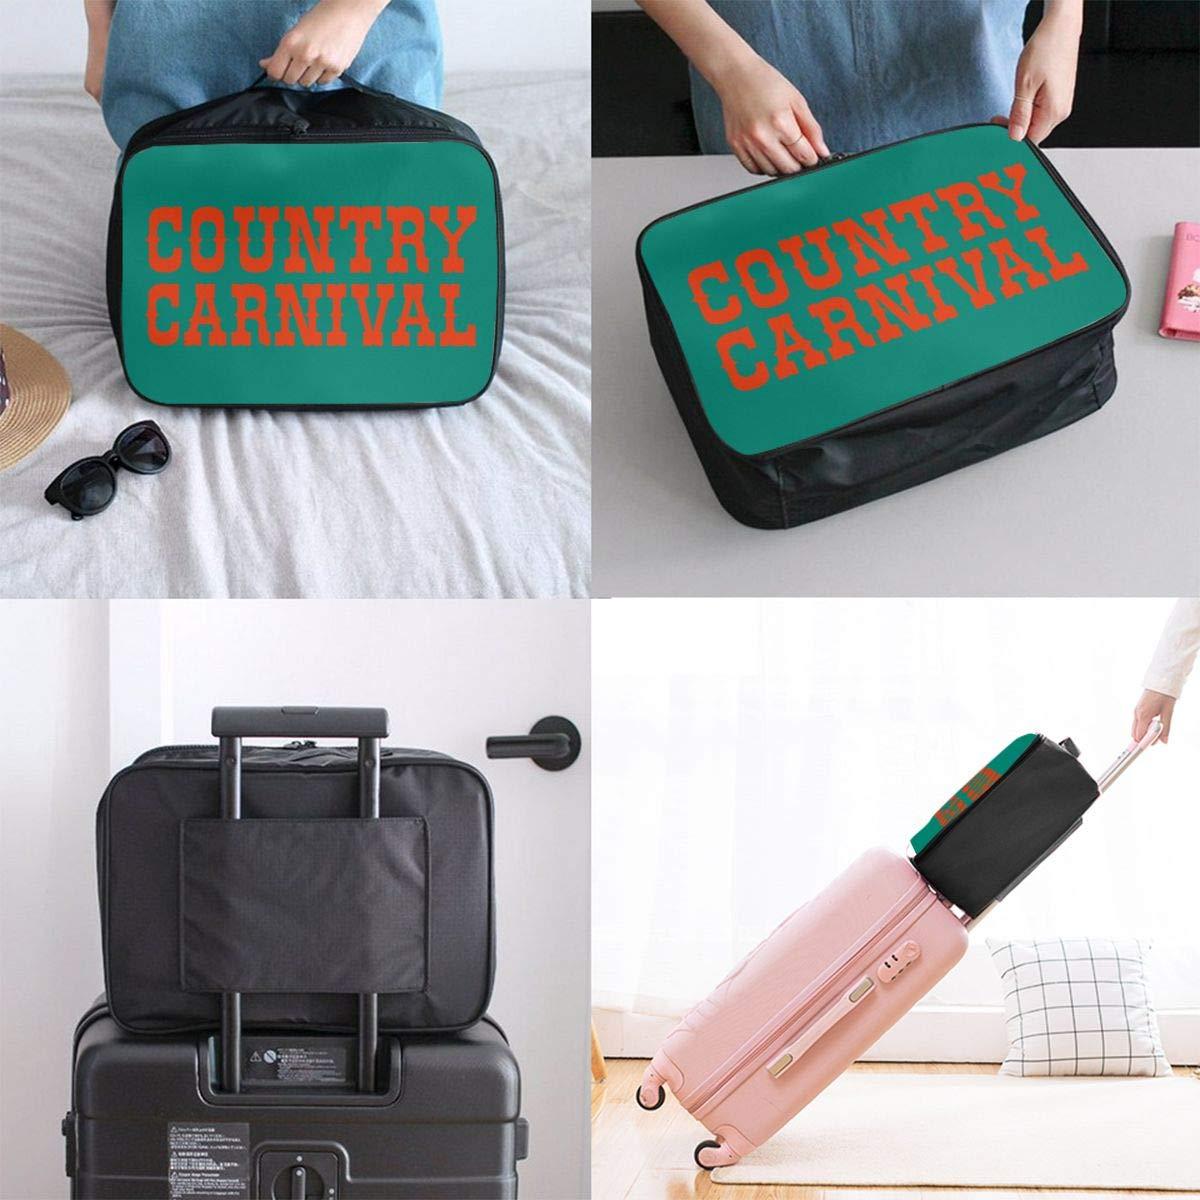 Travel Luggage Duffle Bag Lightweight Portable Handbag Country Carnival Large Capacity Waterproof Foldable Storage Tote